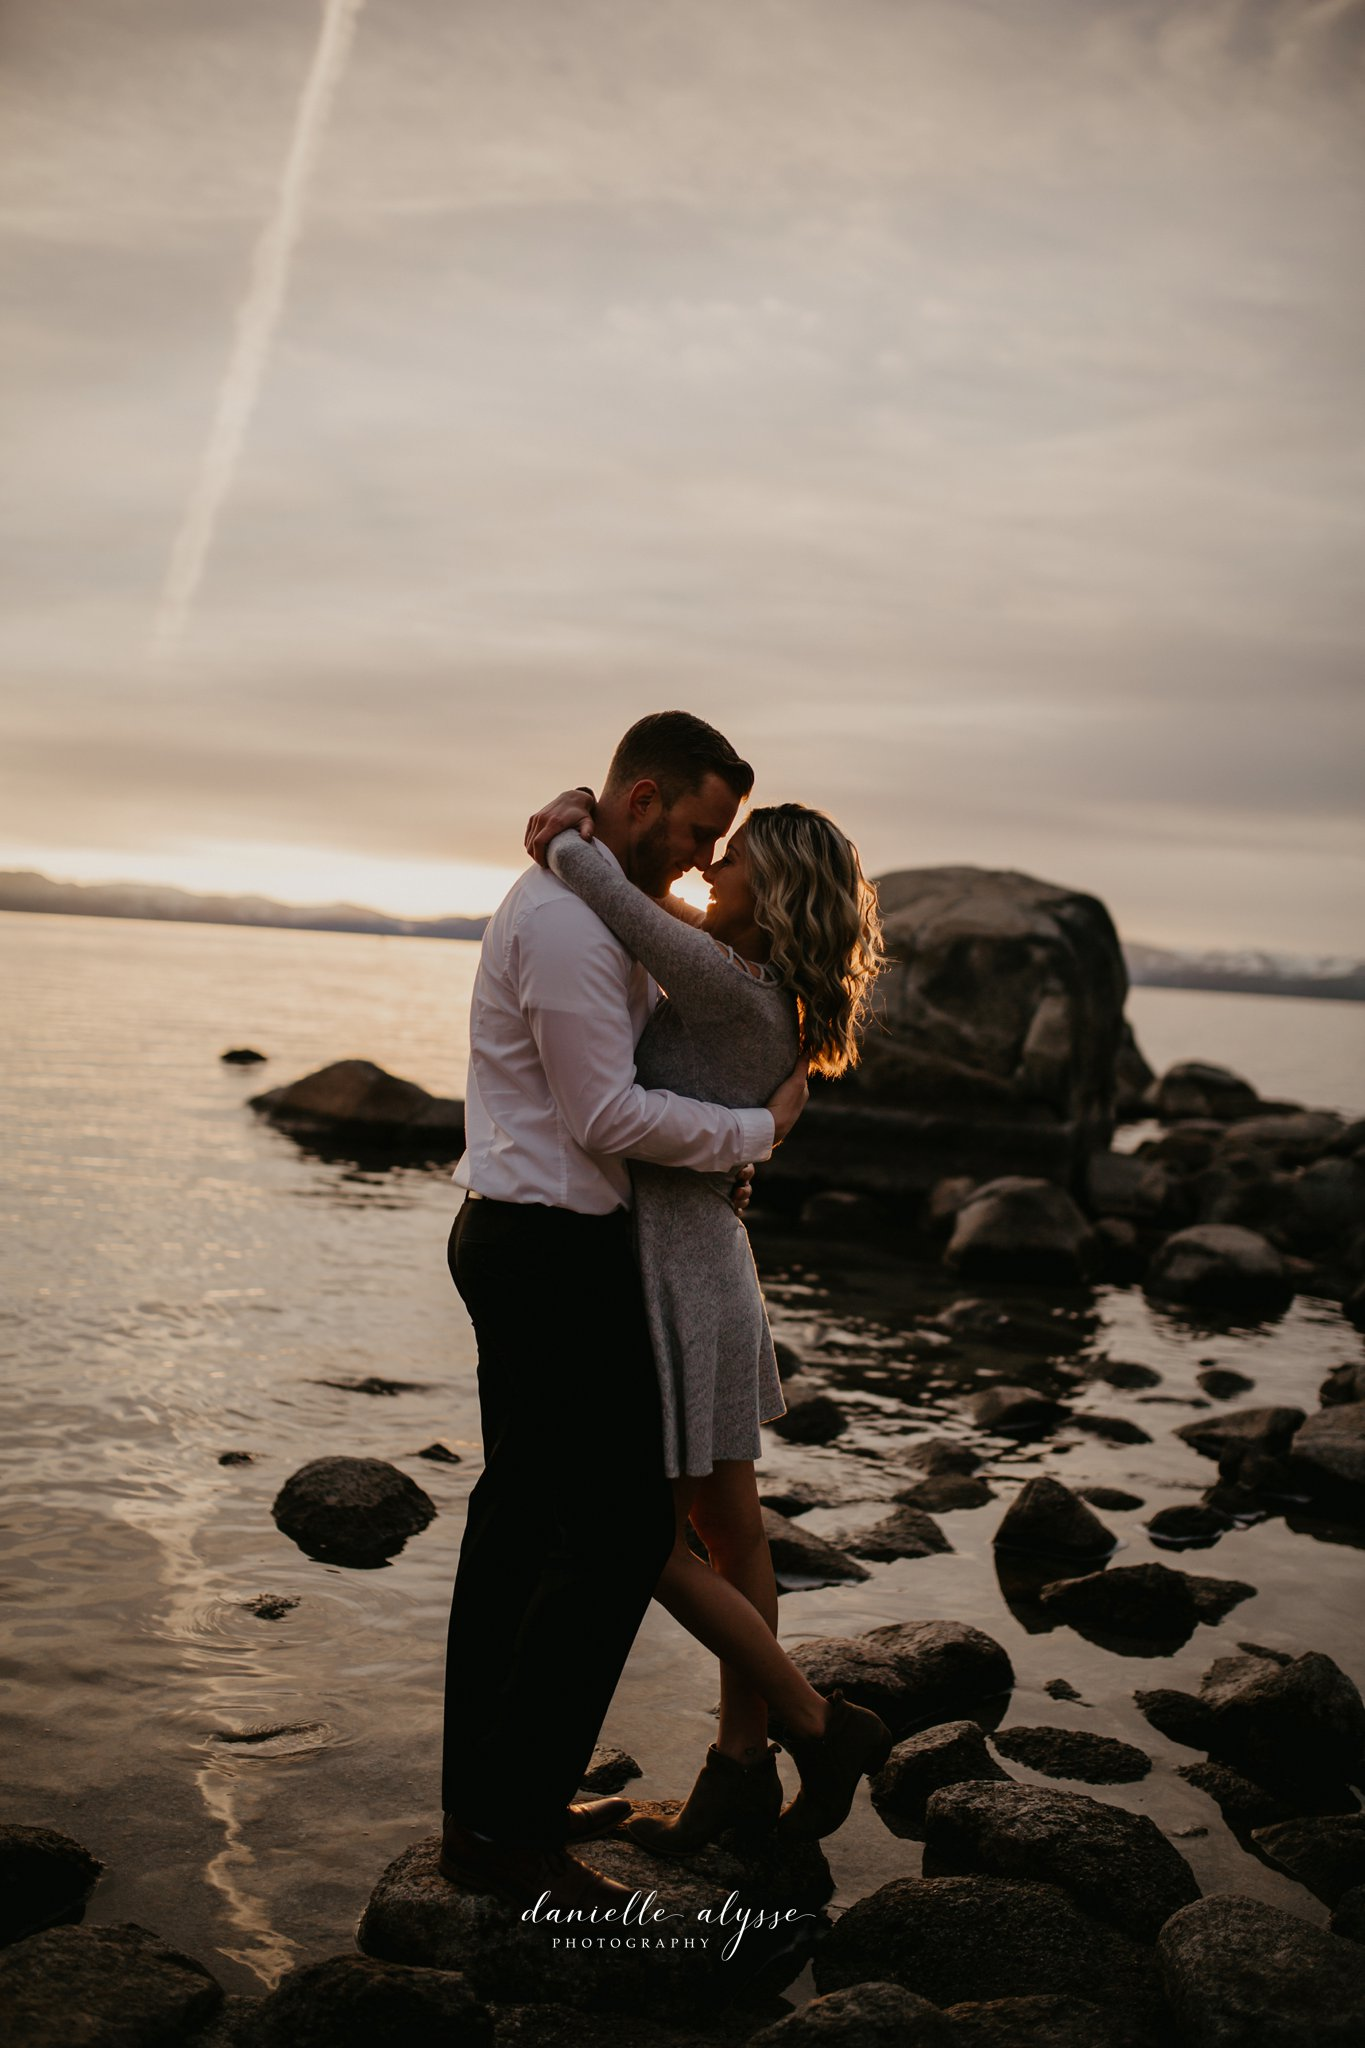 181226_engagement_brittney_fred_tahoe_sand_harbor_danielle_alysse_photography_blog_76_WEB.jpg